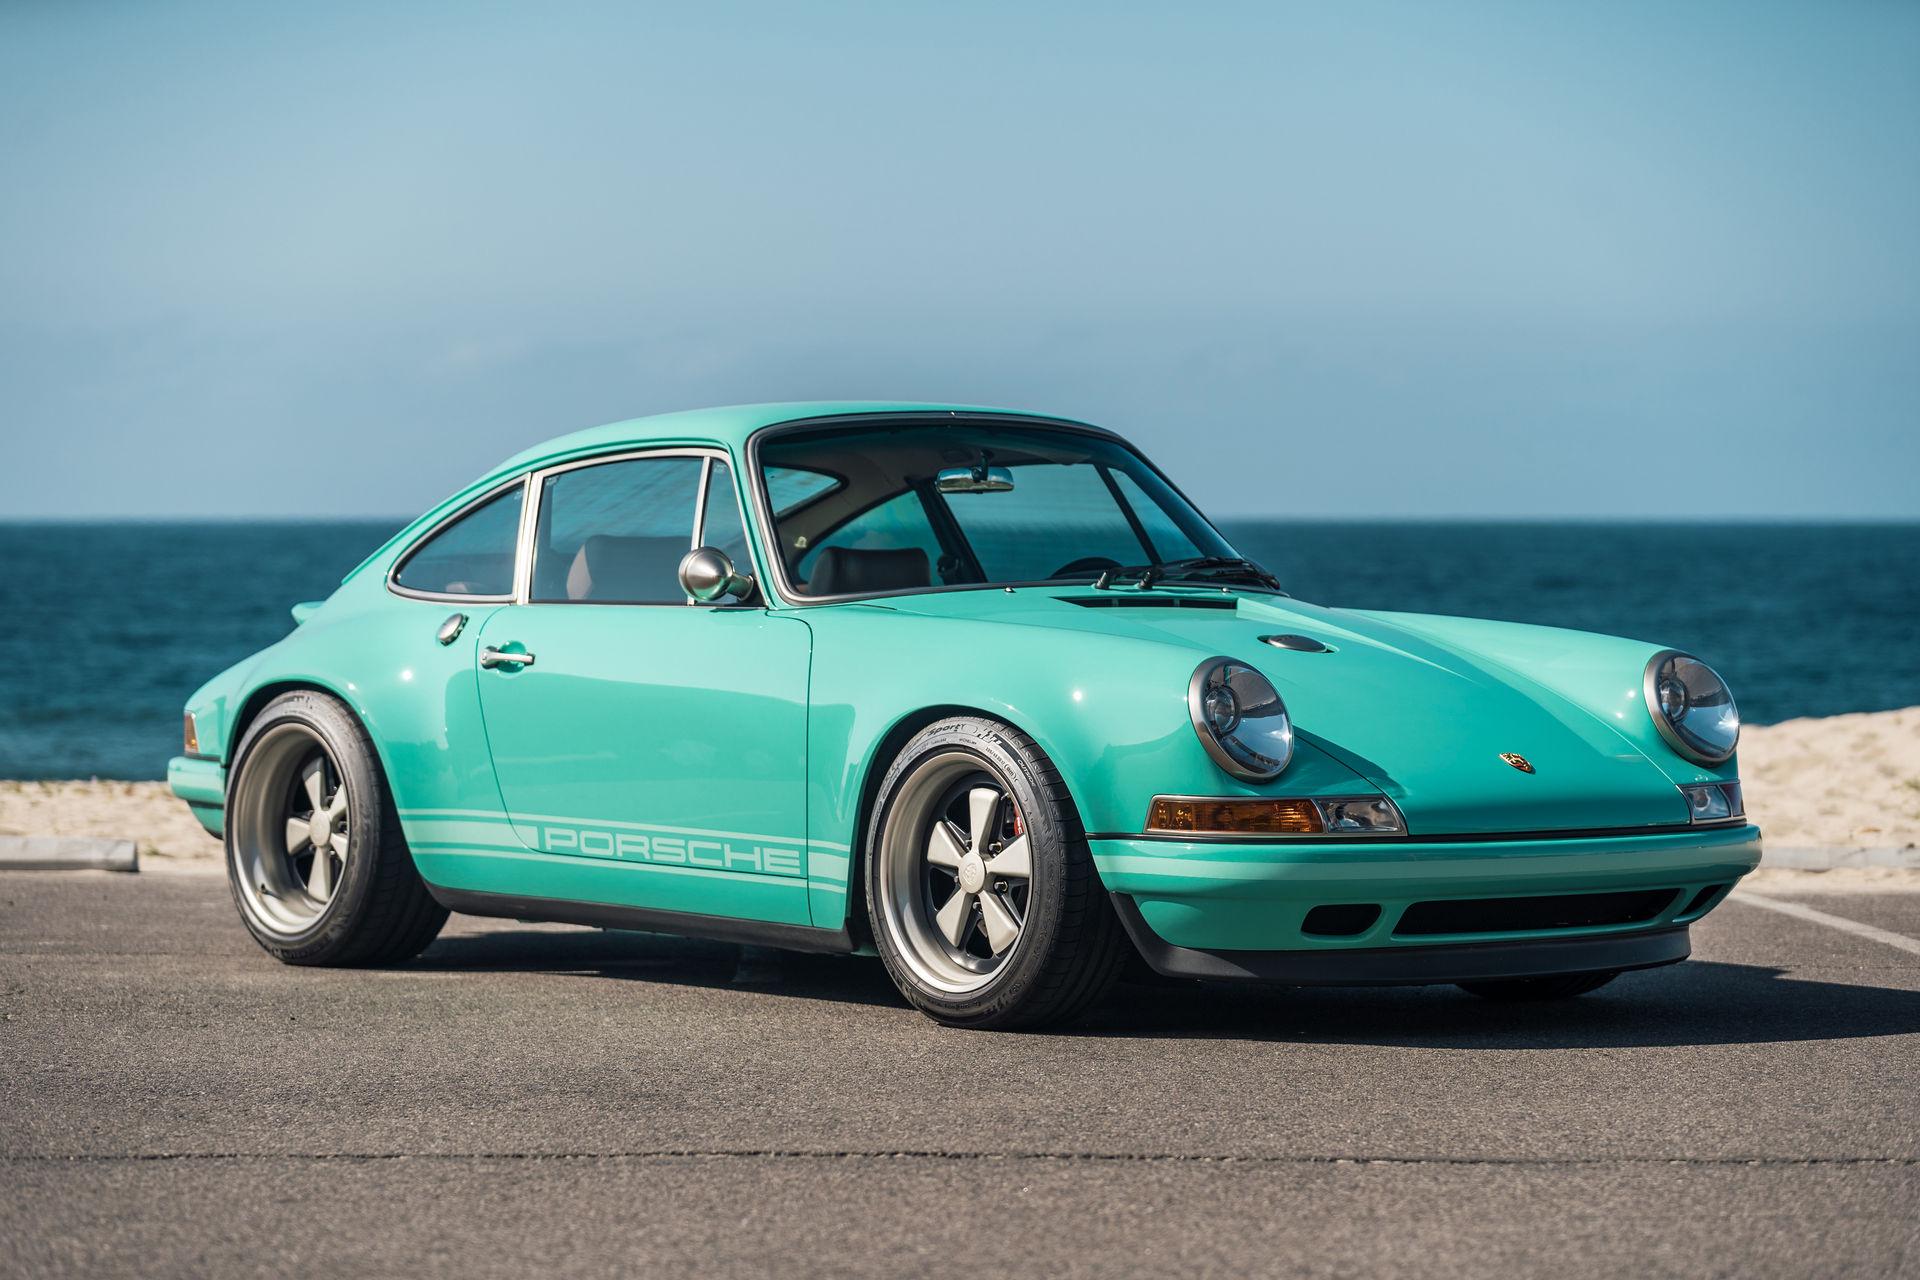 Porsche-911-Malibu-Singer-1